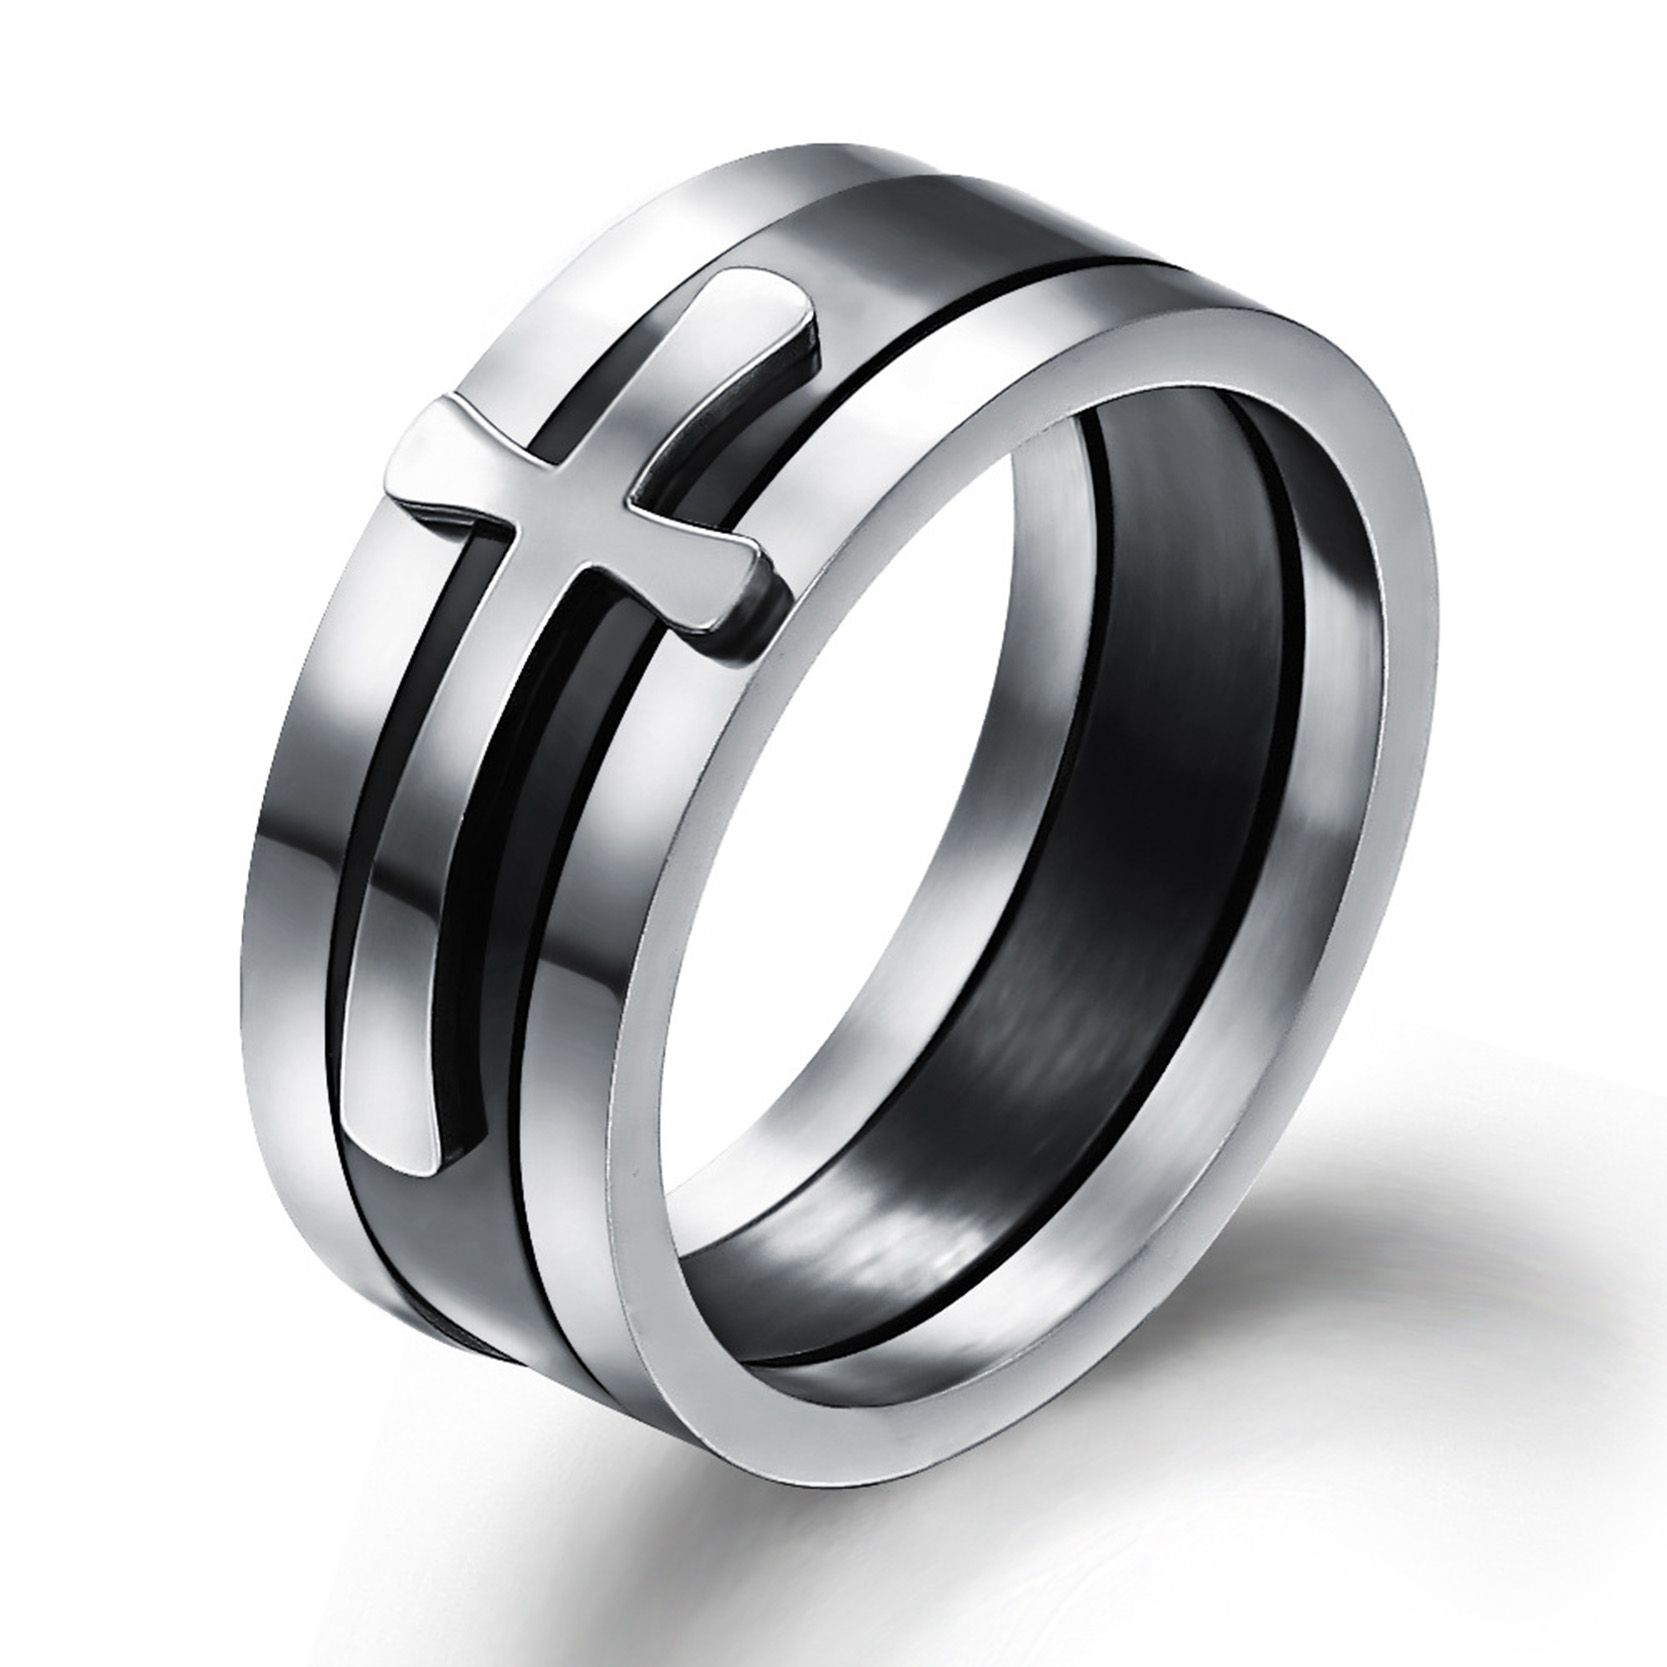 fashion thumb ring,gold thumb ring for man,gold thumb ring for ...